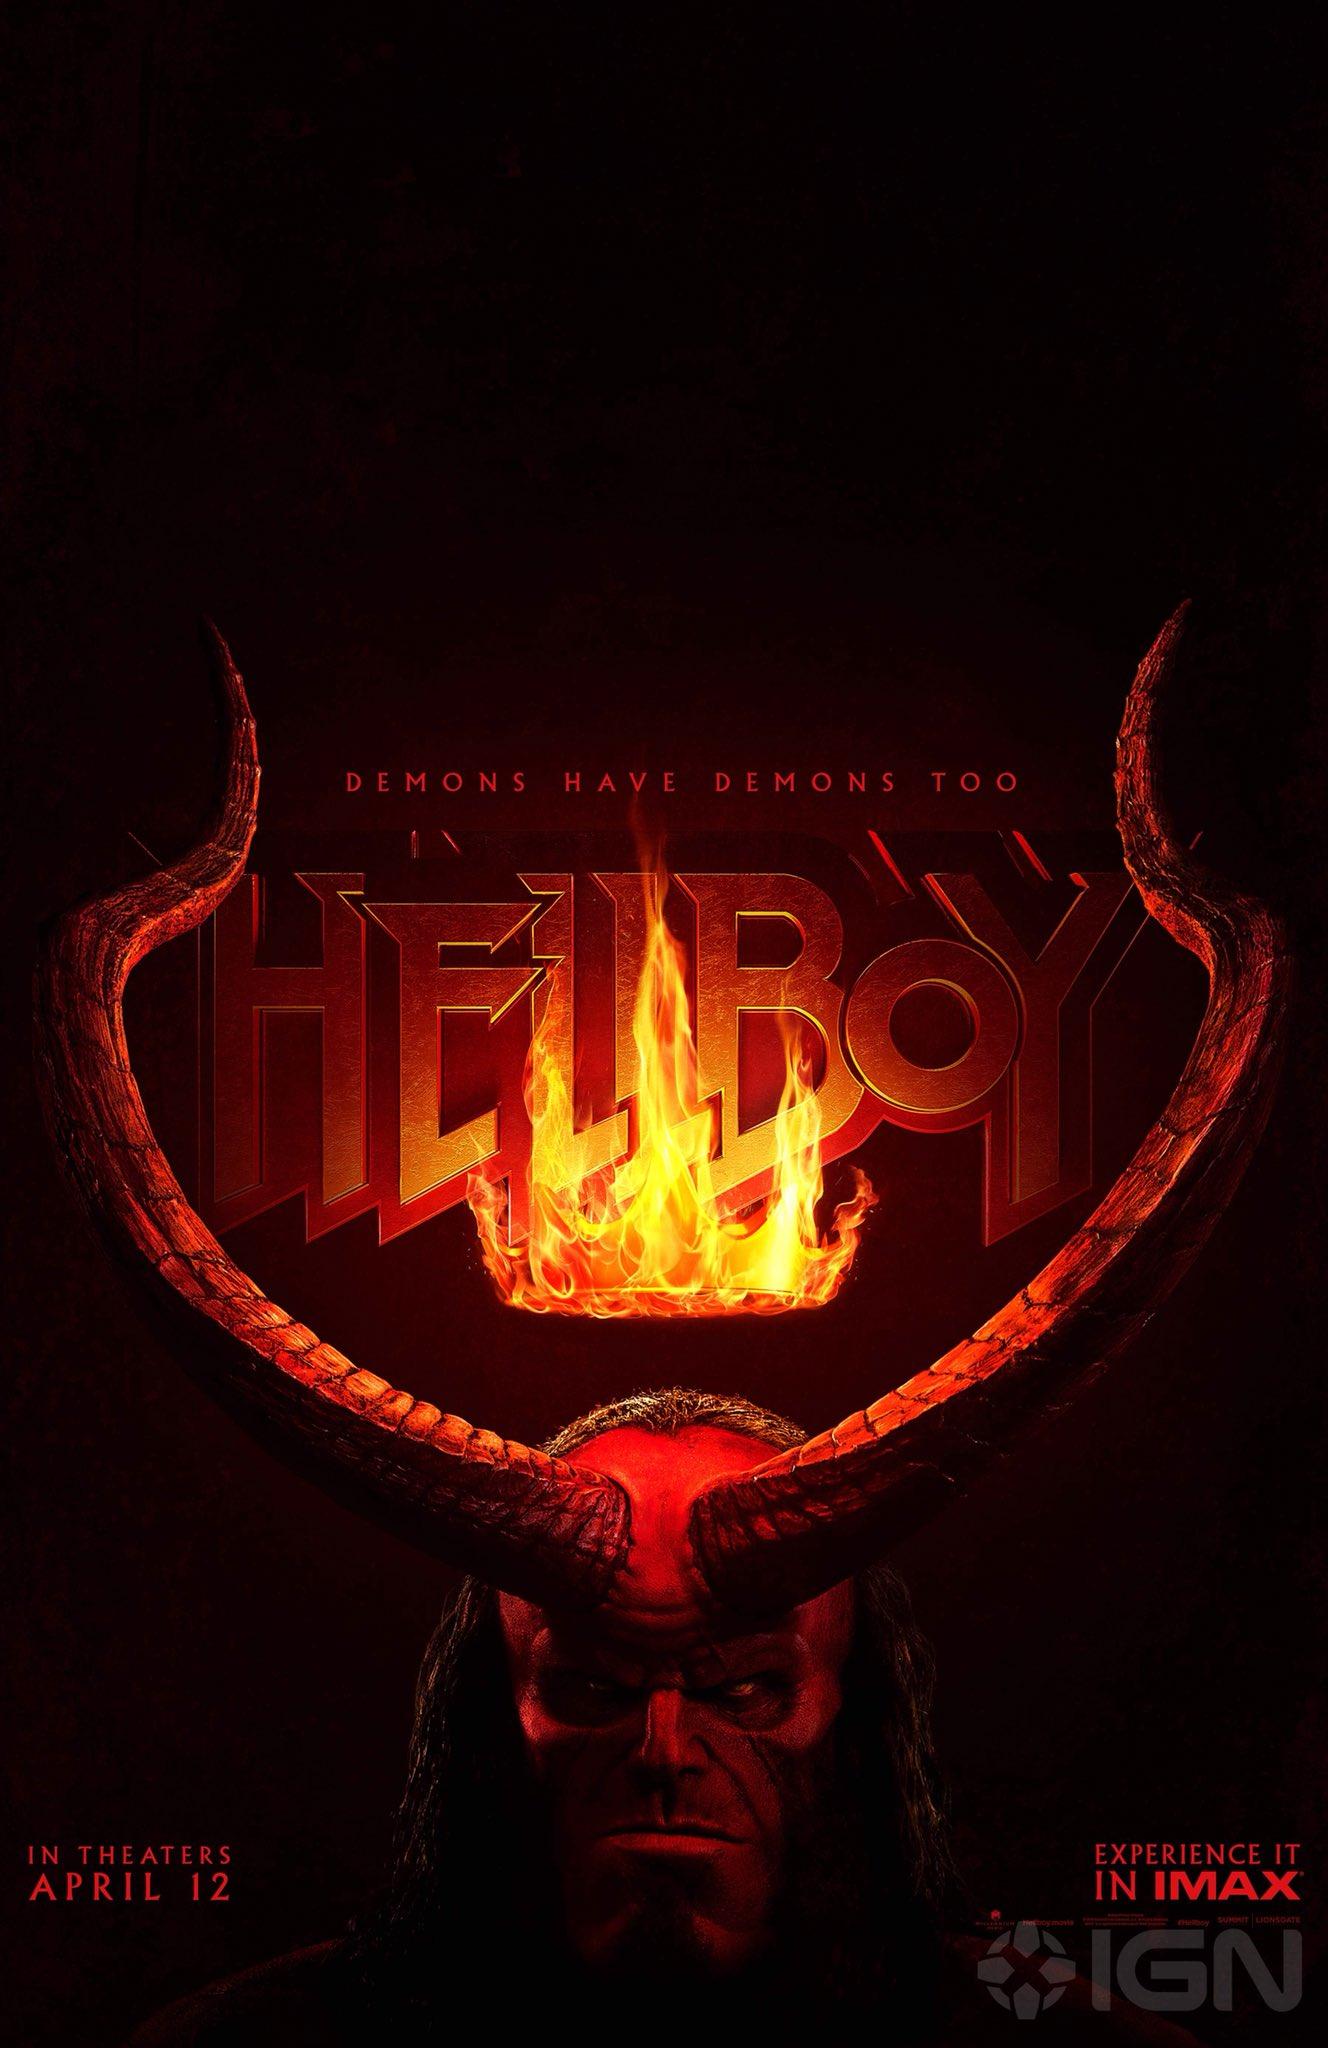 Hellboy Reboot - Page 3 DuopQCxWoAIgI1u